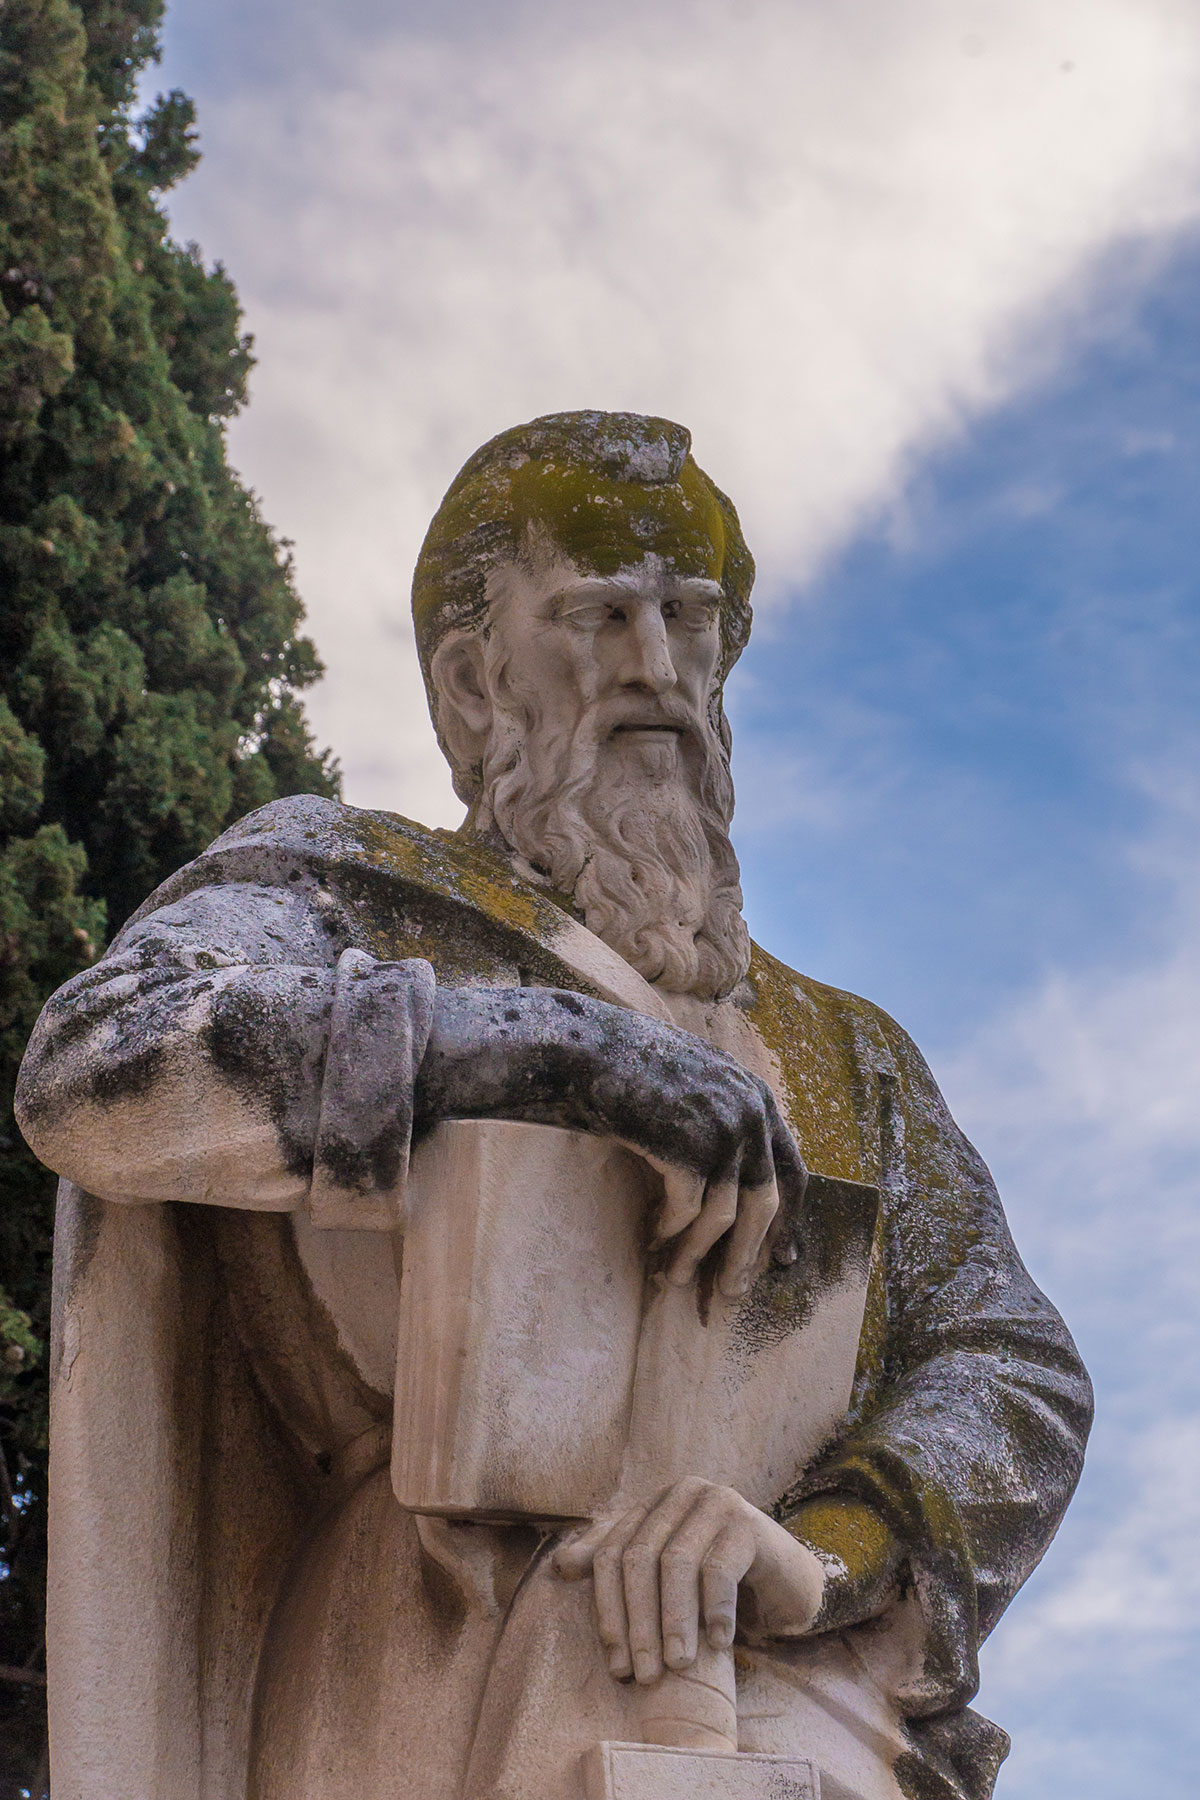 Spain, Catalonia, Tarragona, statue